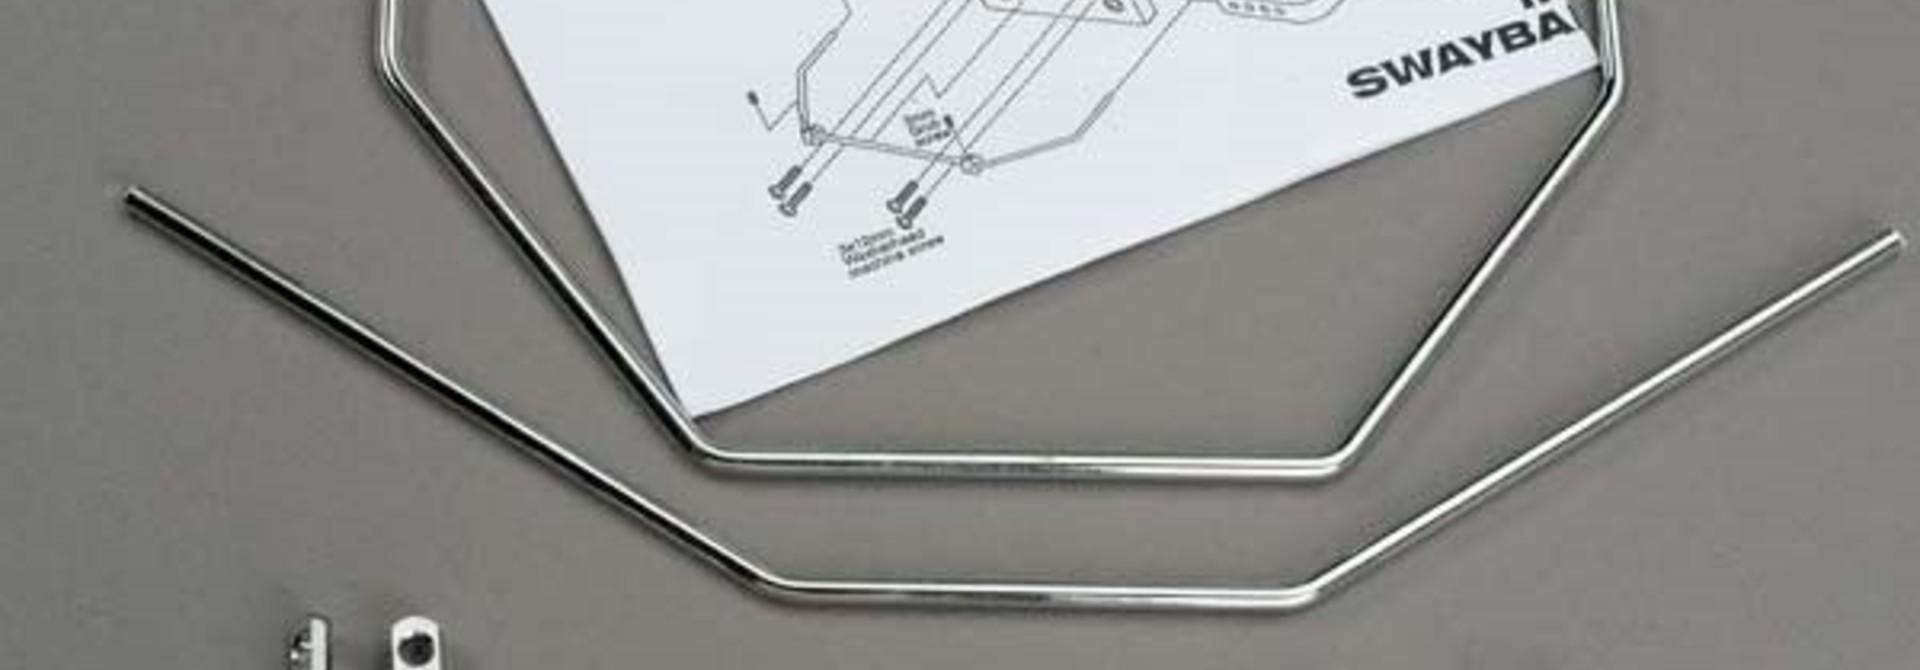 Anti-sway bars (front & rear) w/ hardware, TRX6078